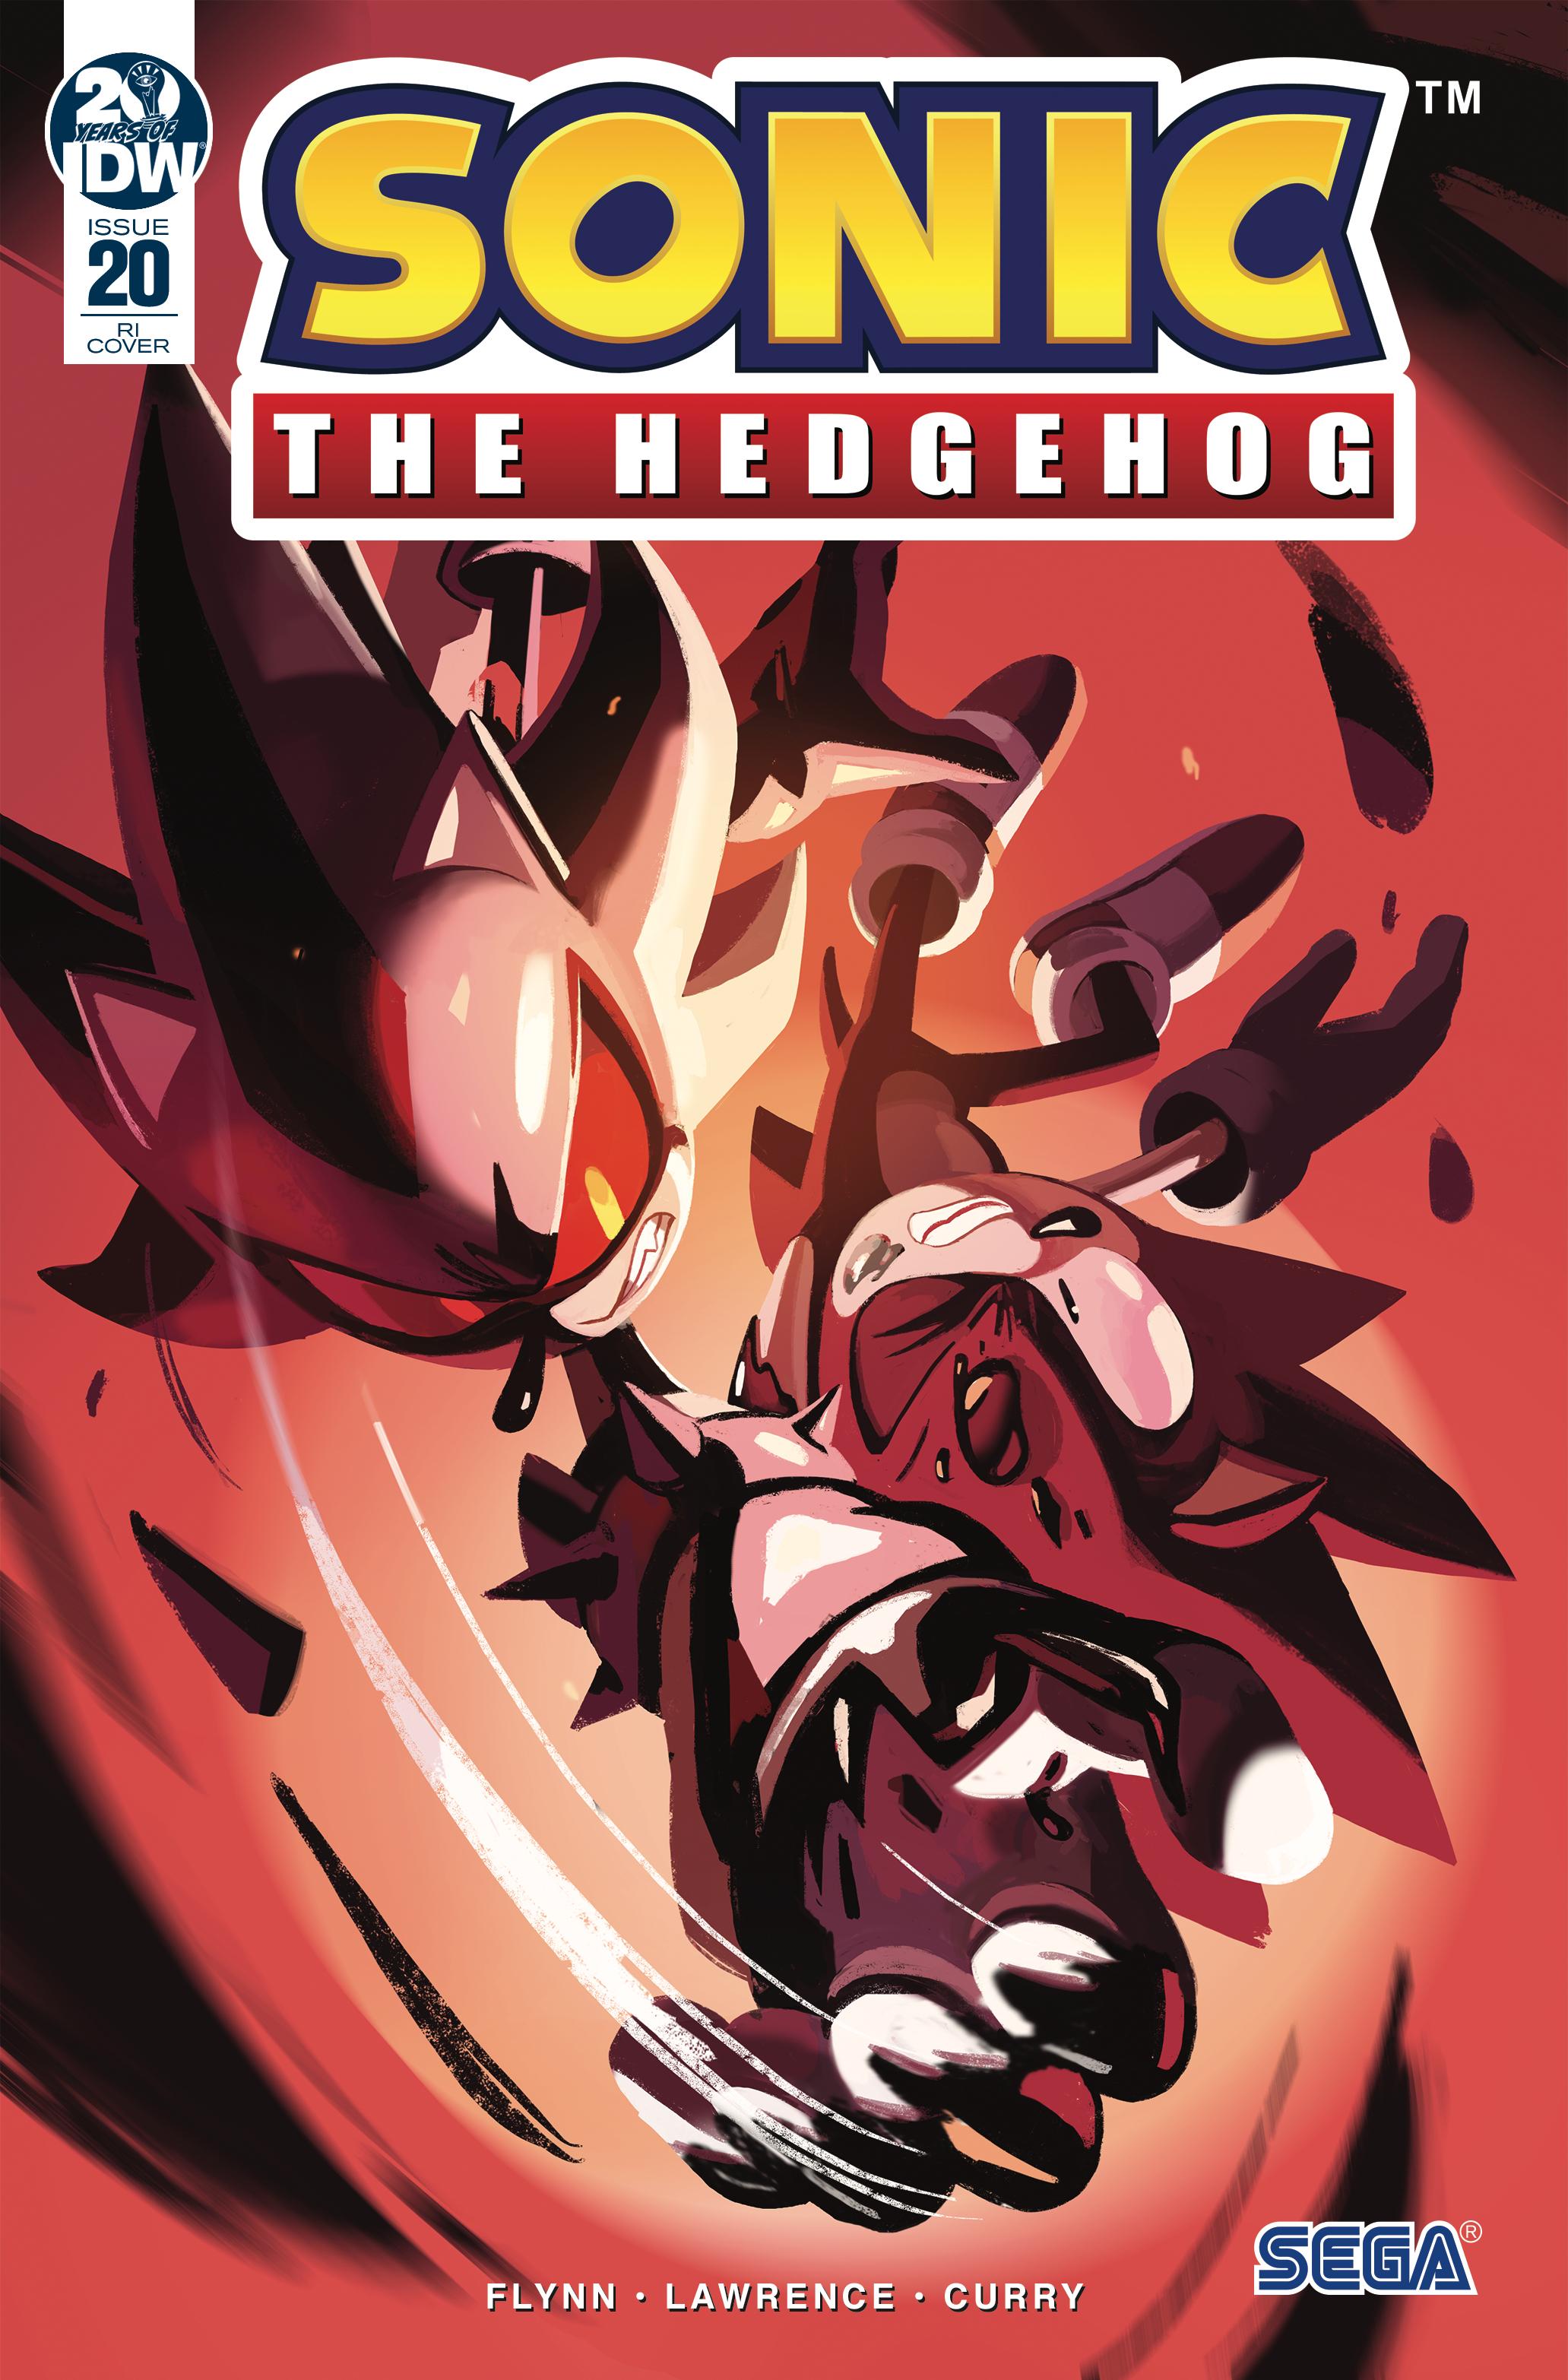 Idw Sonic The Hedgehog Issue 20 Sonic News Network Fandom